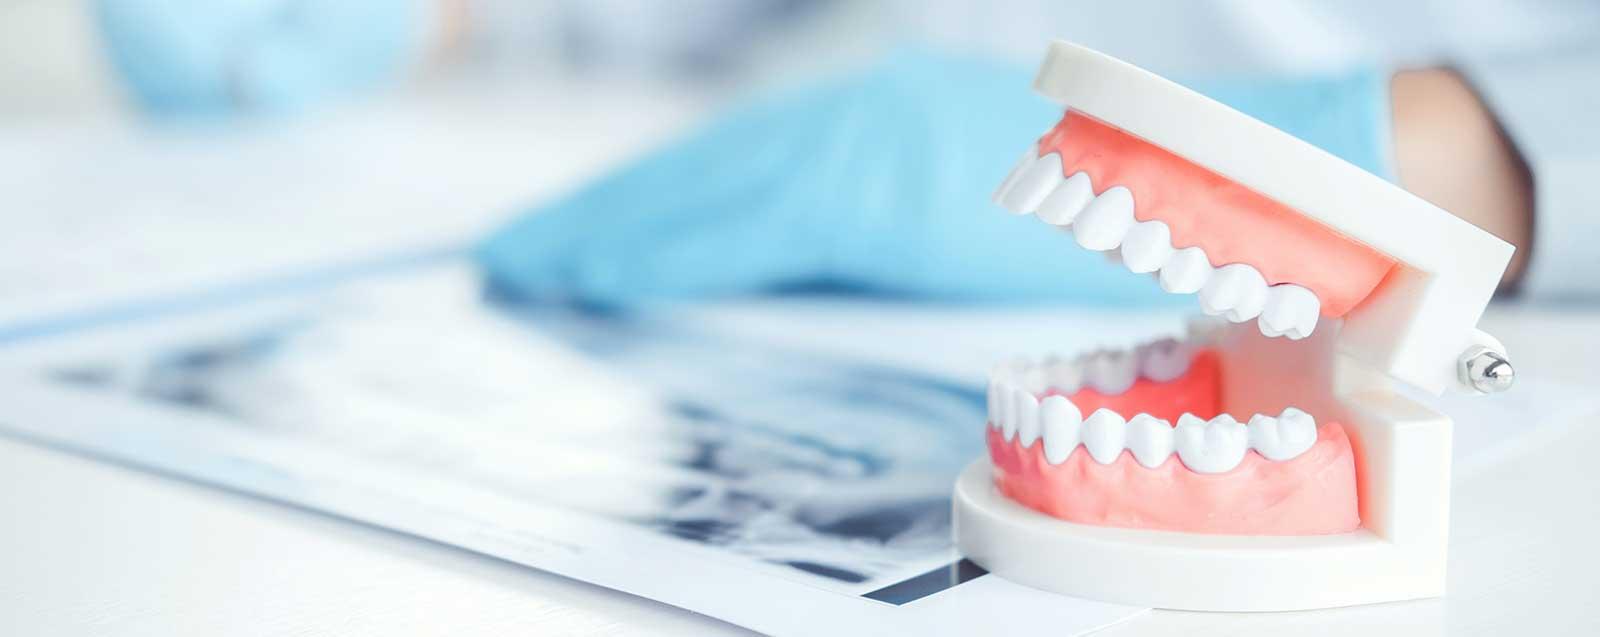 Zahnersatz Zahnarzt Dominik Meling